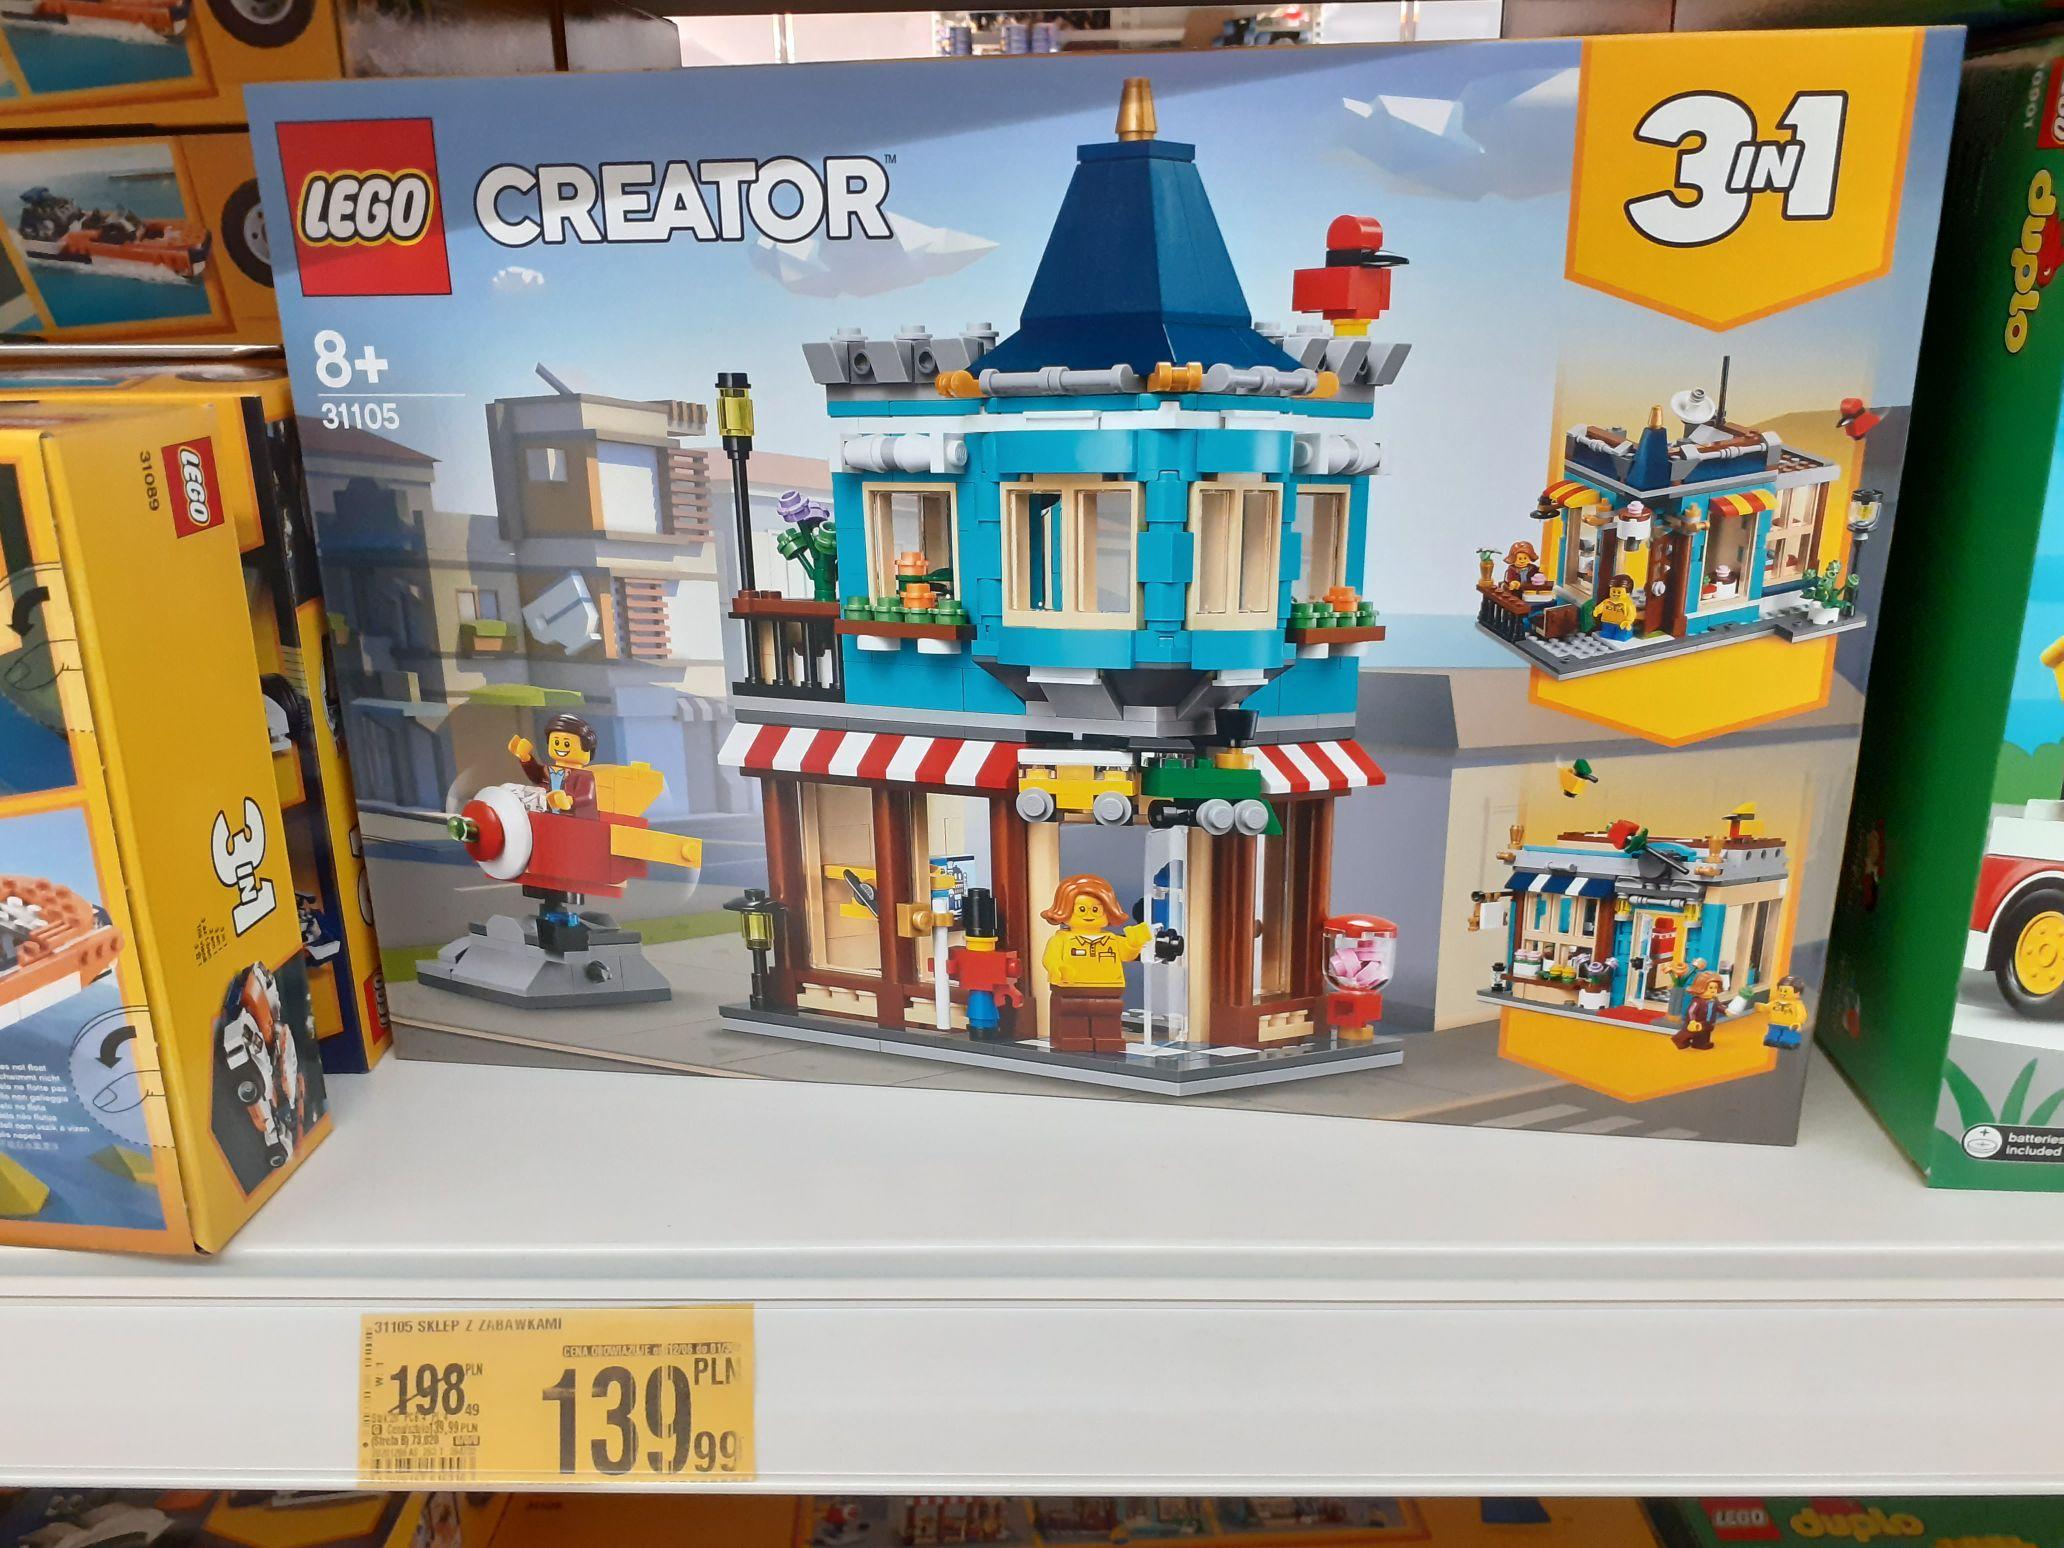 Lego Creator 31105